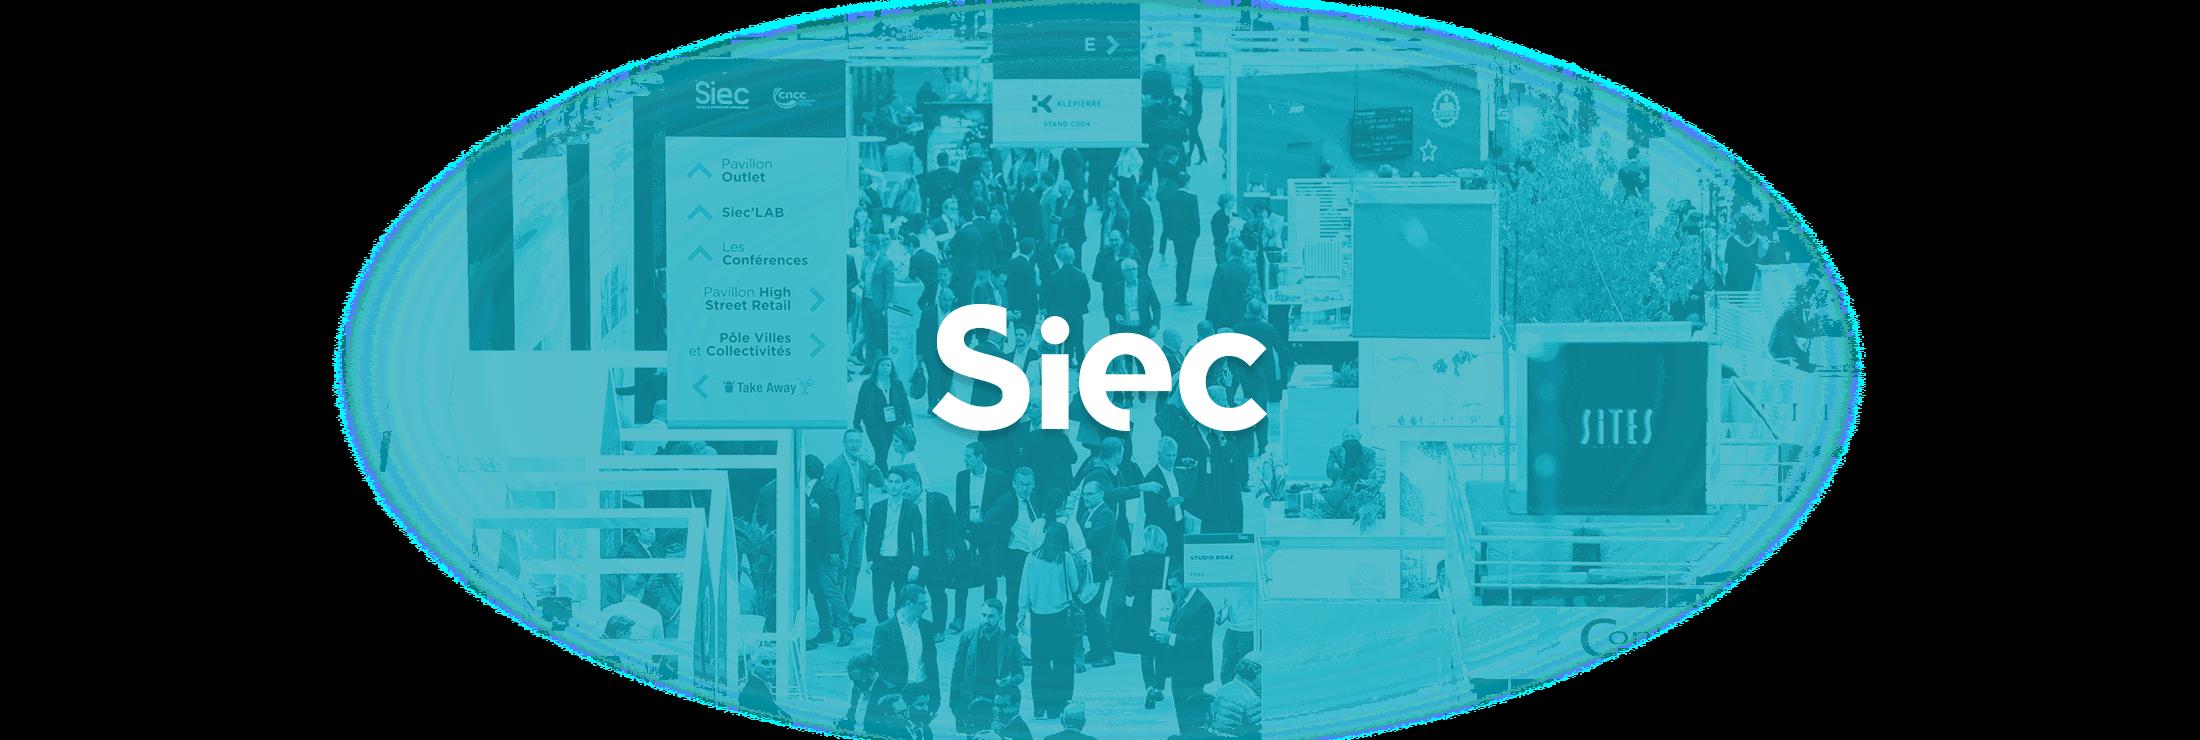 cncc-siec-osb-communication-logo-design